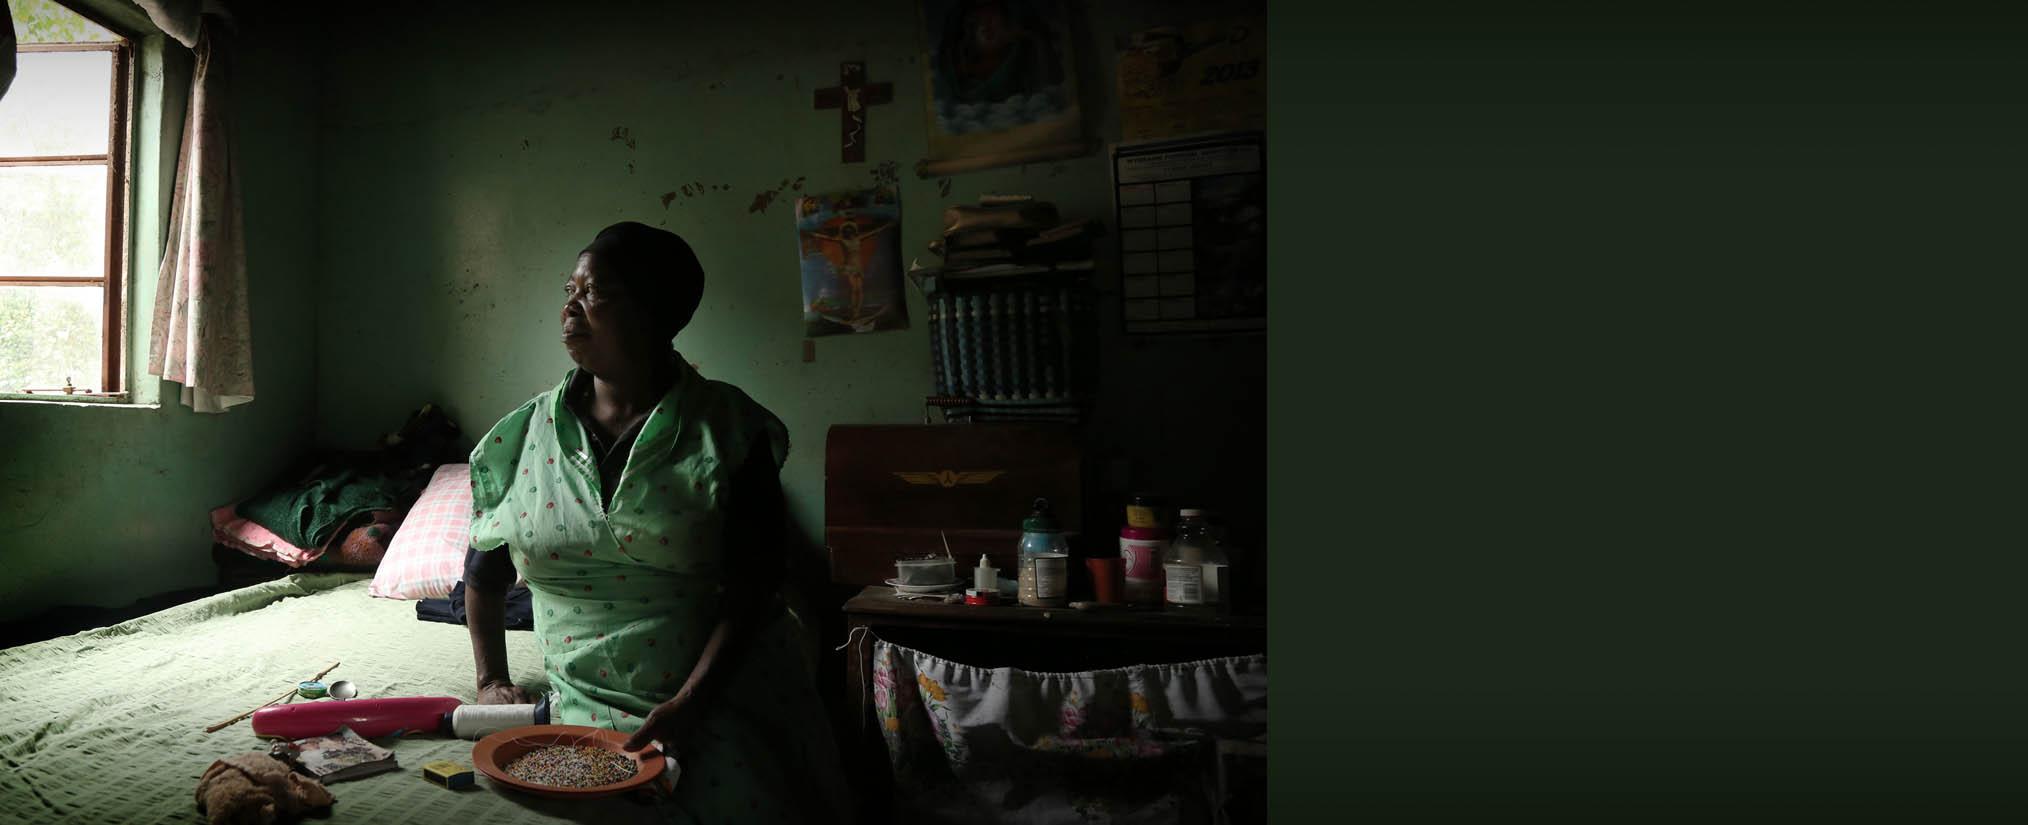 woza moya online craft store community-upliftment-funky-fashion-art-crafts-non-profit-npo-kwazulu-natal-kzn-south-africa-mandela-fashion-community-upliftment